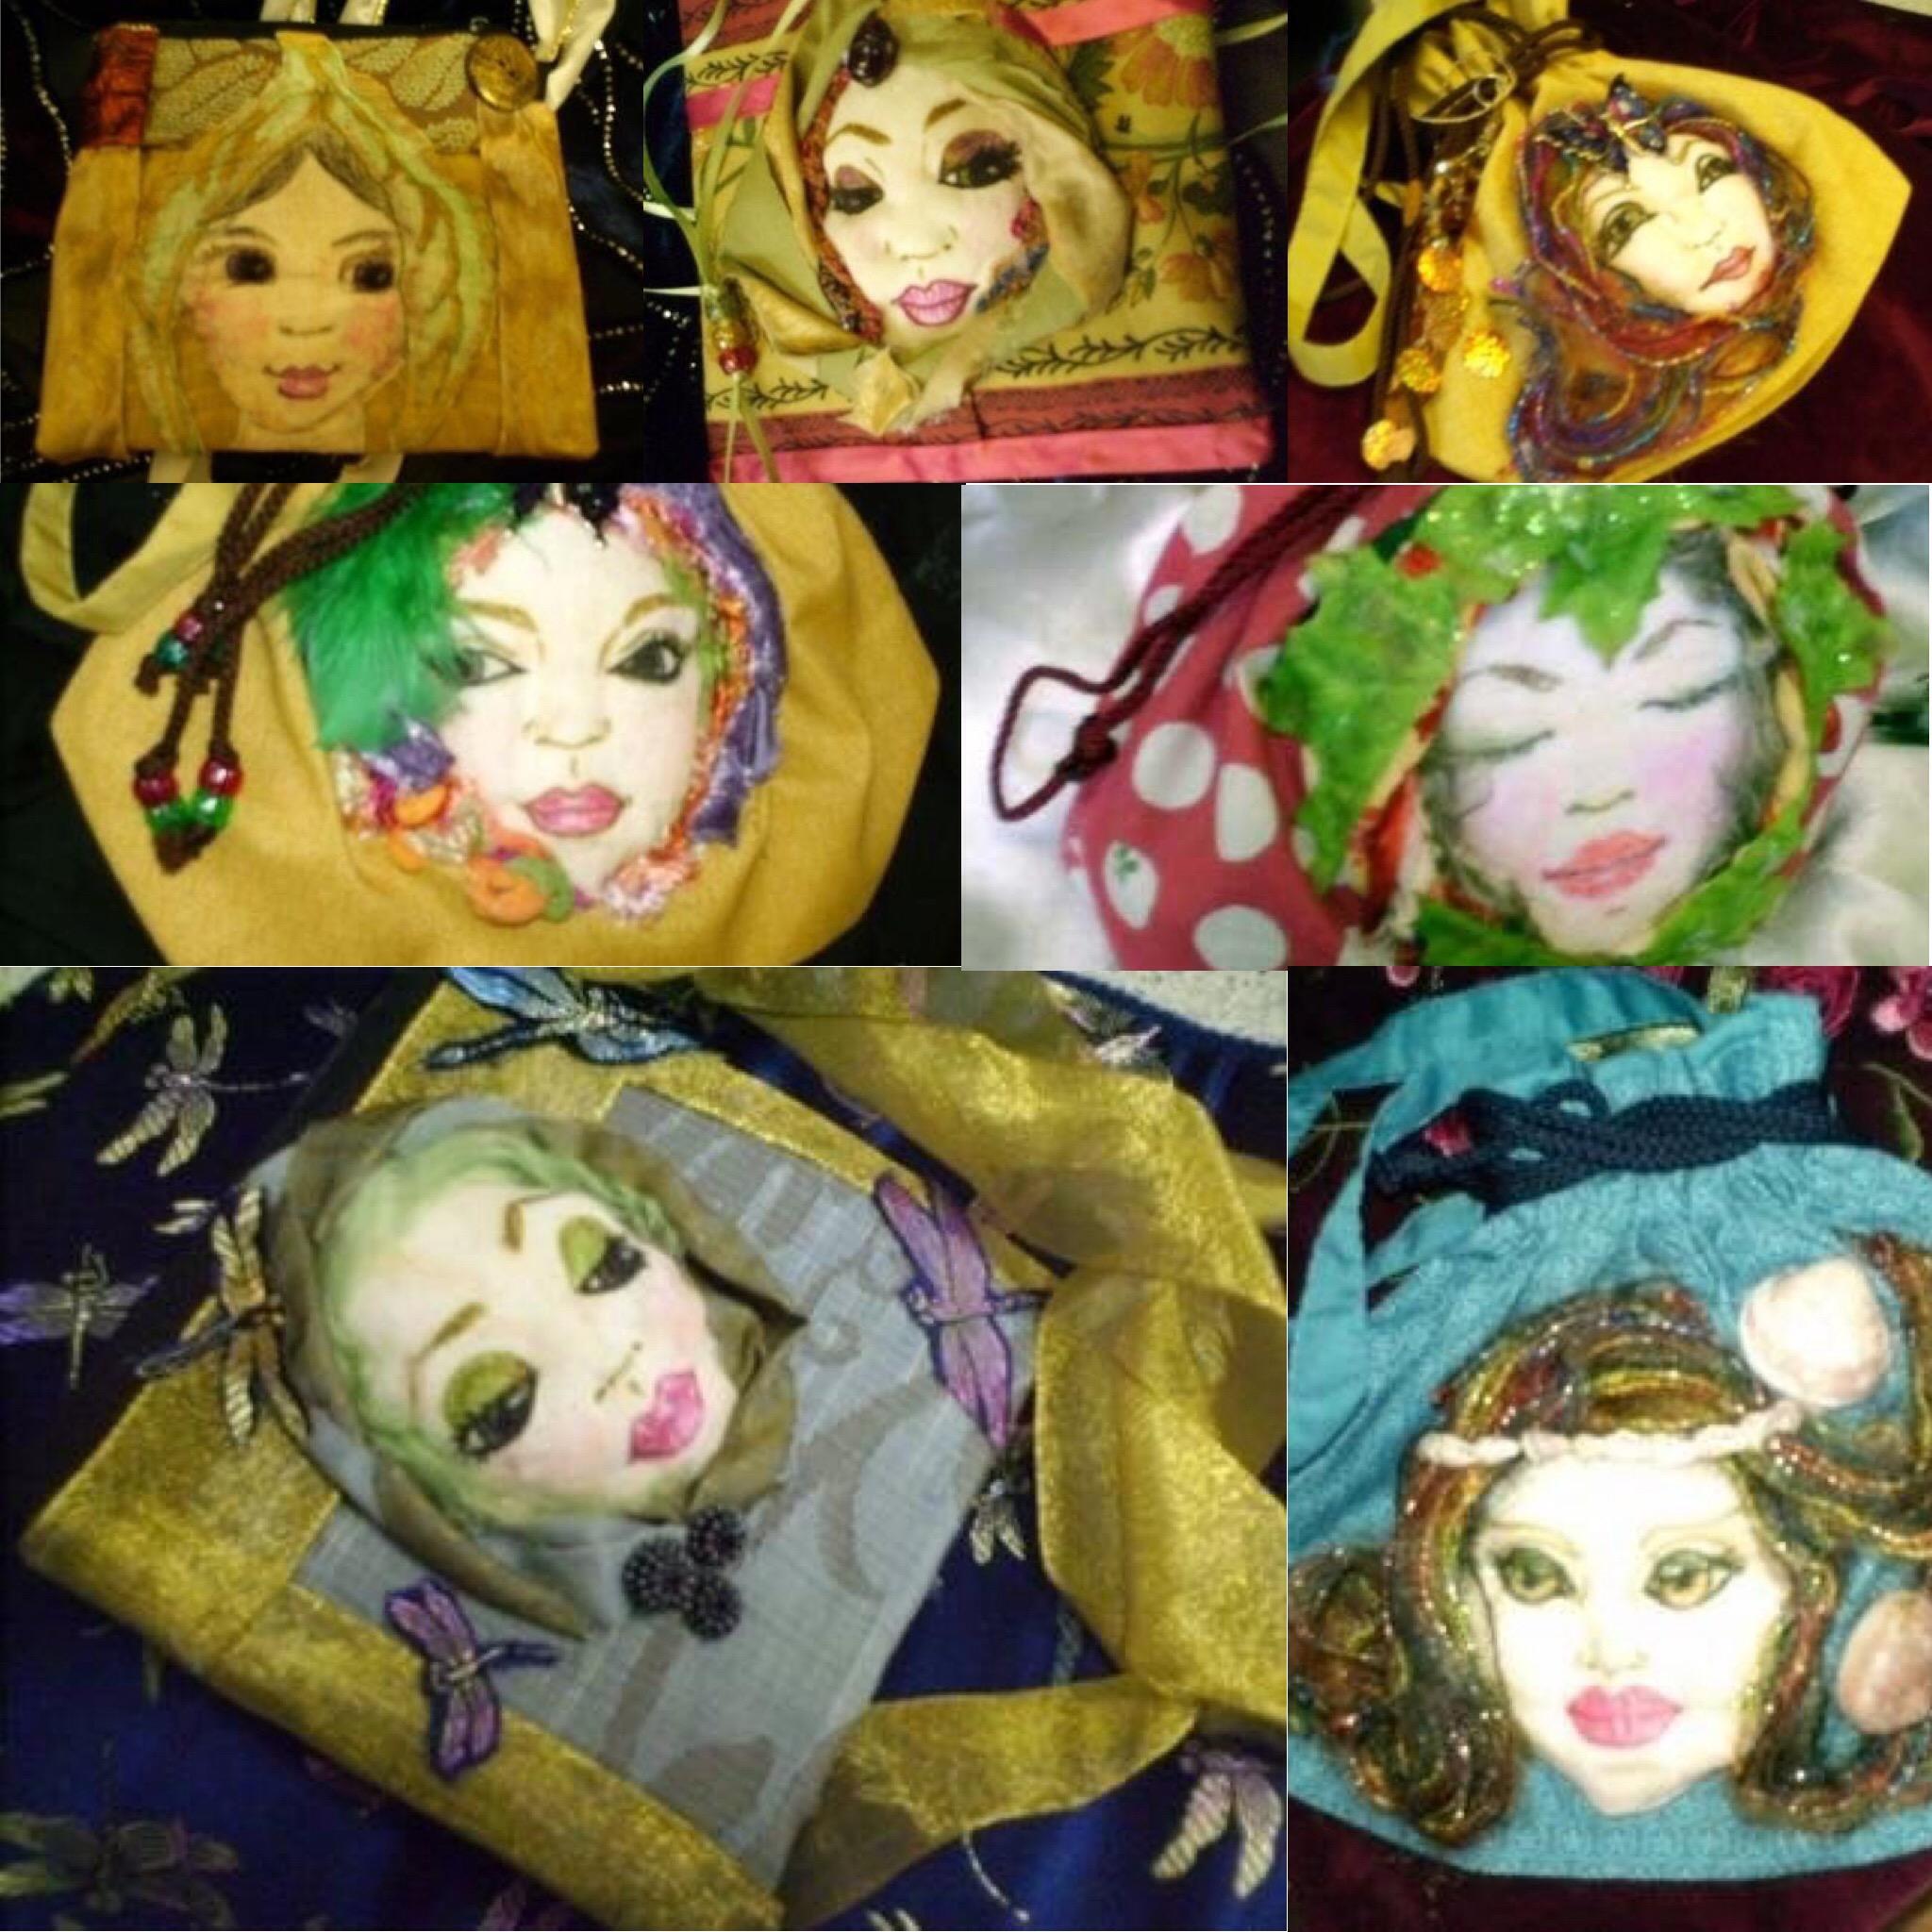 Fairy face handbag-evening bag-purse (53730019 Faeryspell Creations) photo